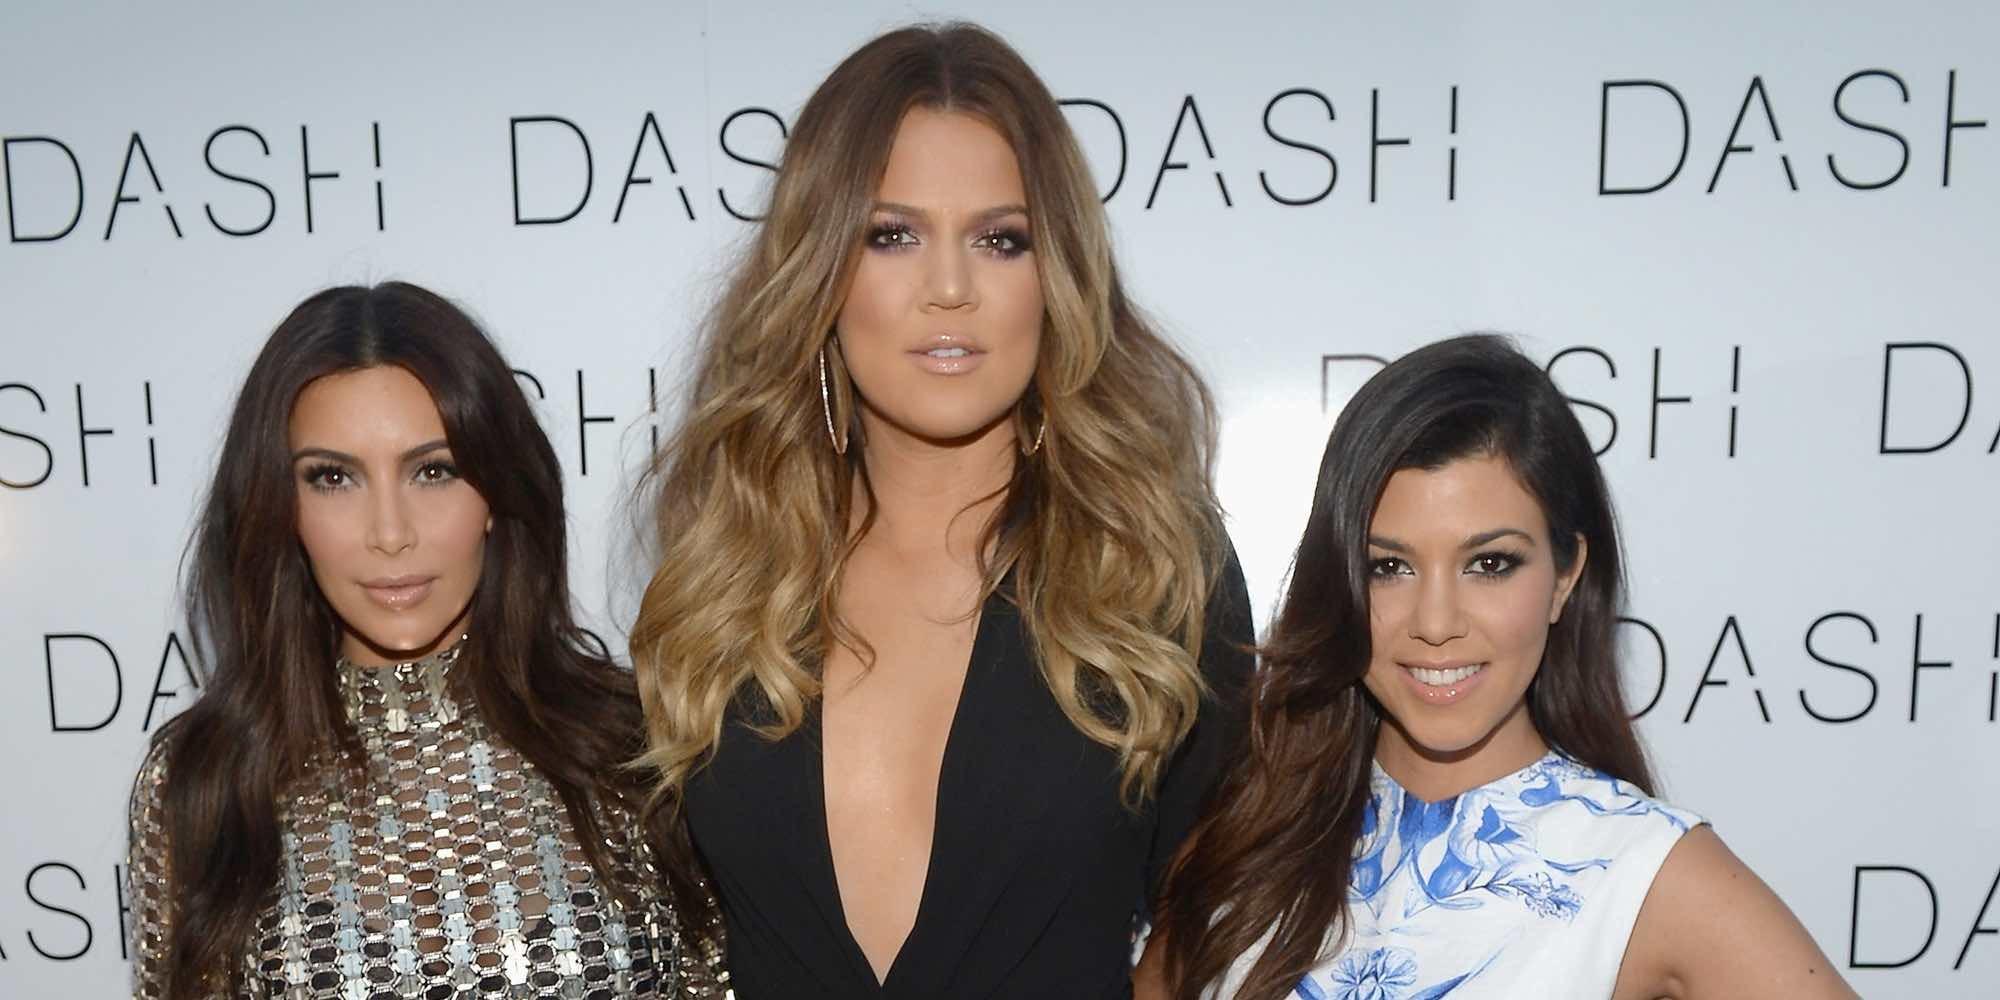 Todas con Kourtney: Los ataques de Kim y Khloe Kardashian a Younes Bendjima